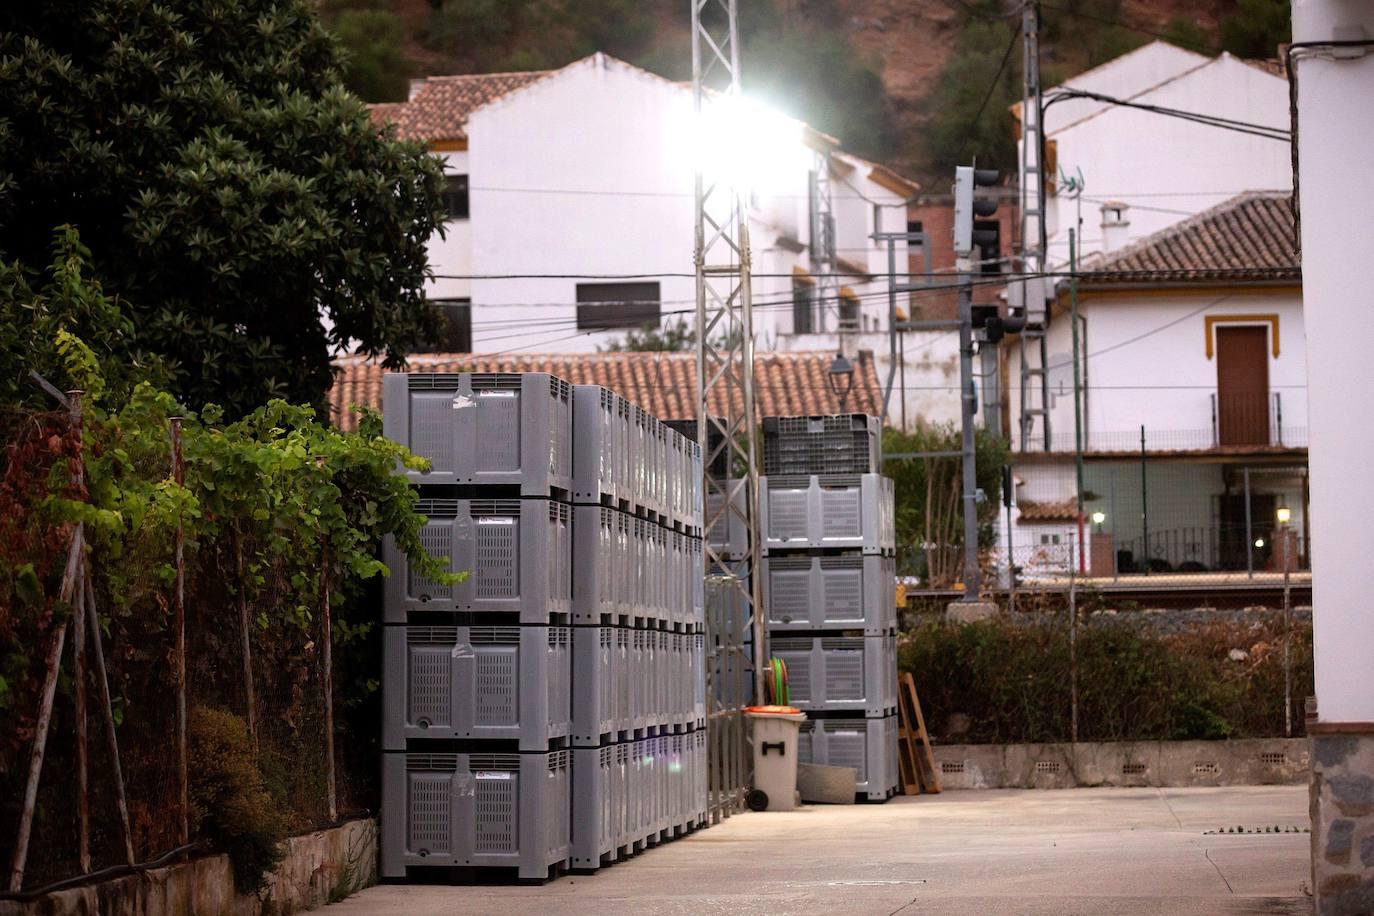 Empresas de Benaoján optan por despedir personal tras la alerta por listeria